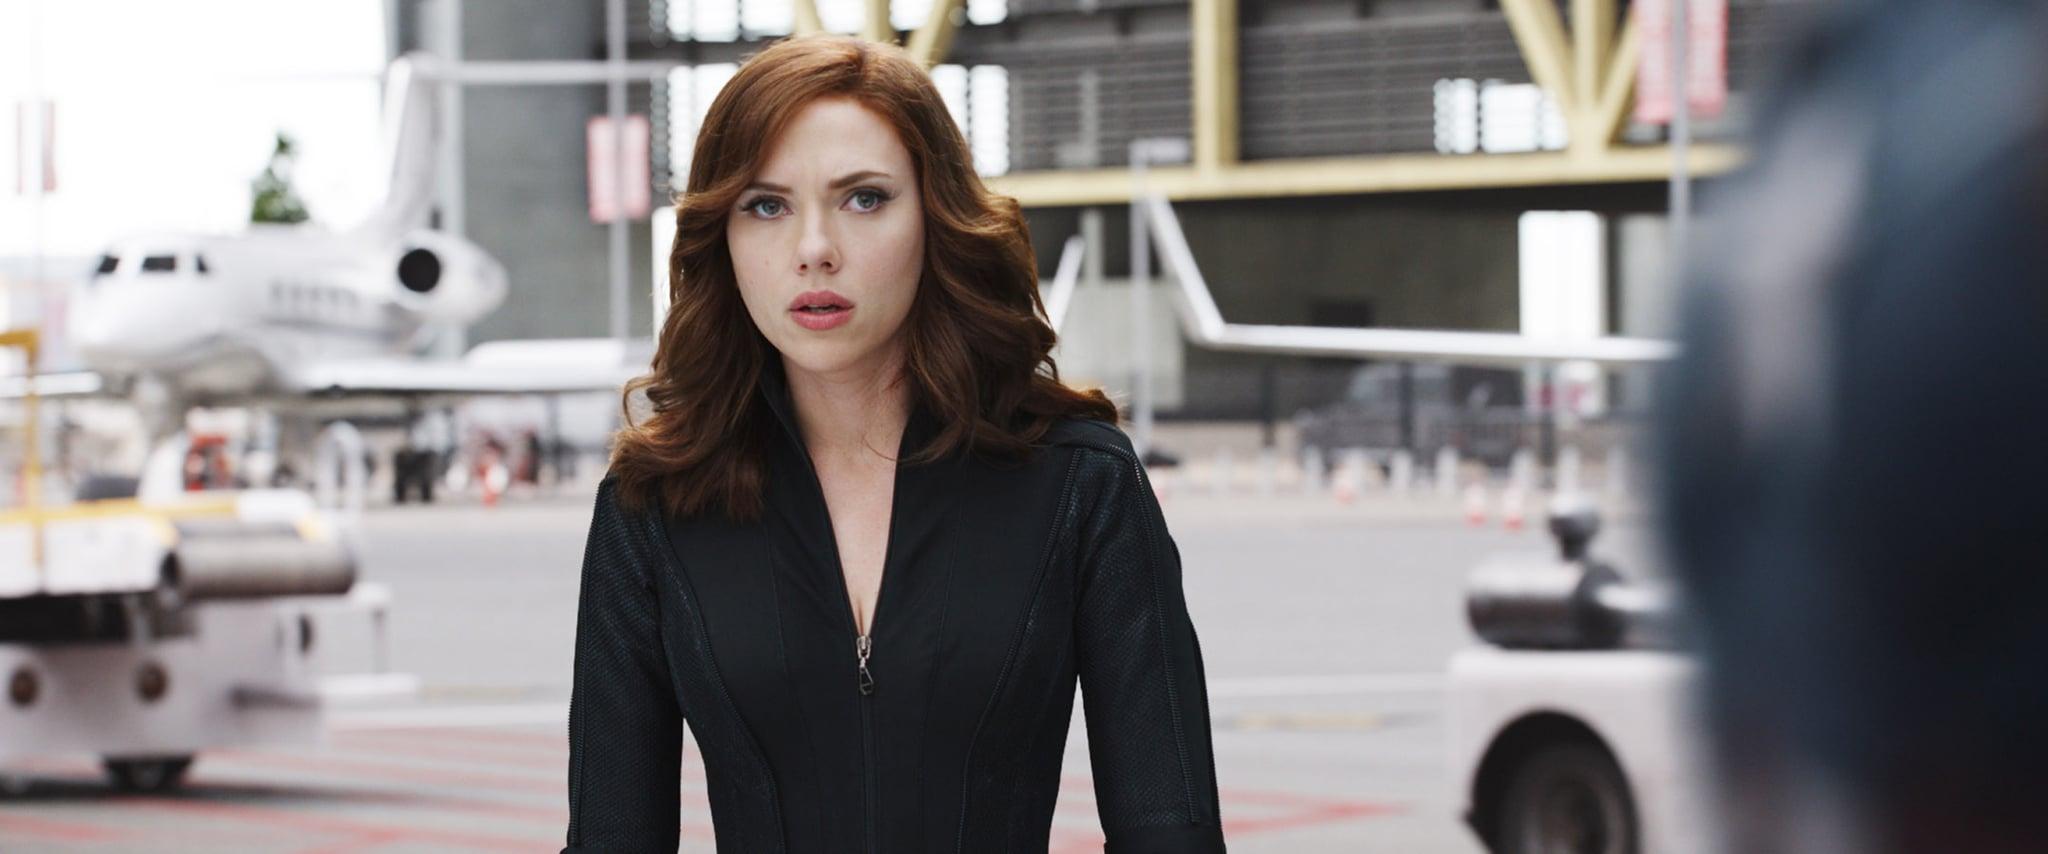 CAPTAIN AMERICA: CIVIL WAR, Scarlett Johansson (as Black Widow/Natasha Romanoff), 2016.  Walt Disney Studios Motion Pictures / courtesy Everett Collection